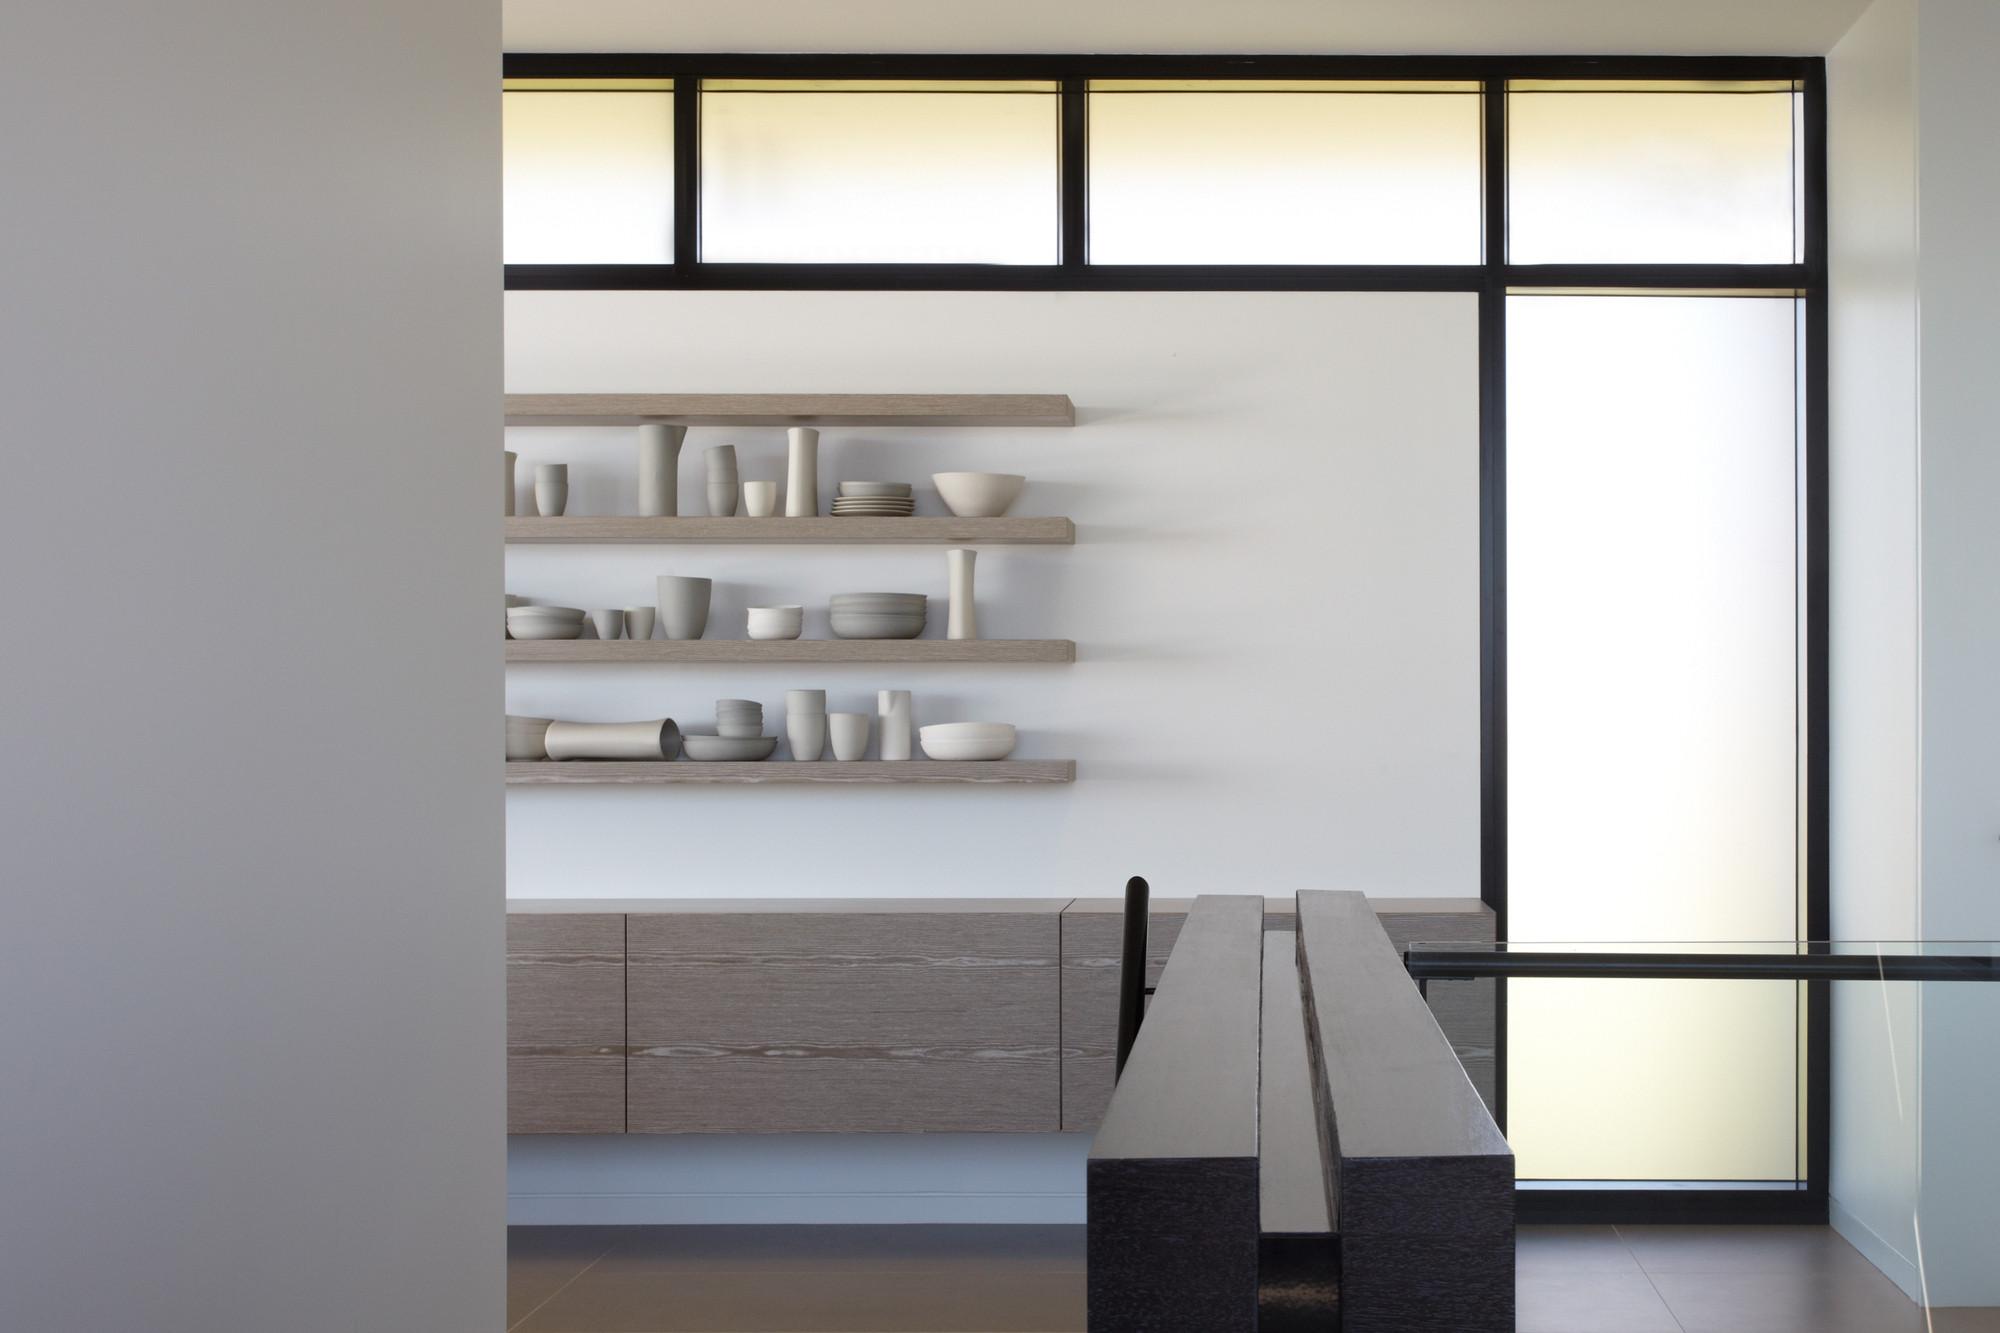 Residencia Lamble / Smart Design Studio . Image © Sharrin Rees